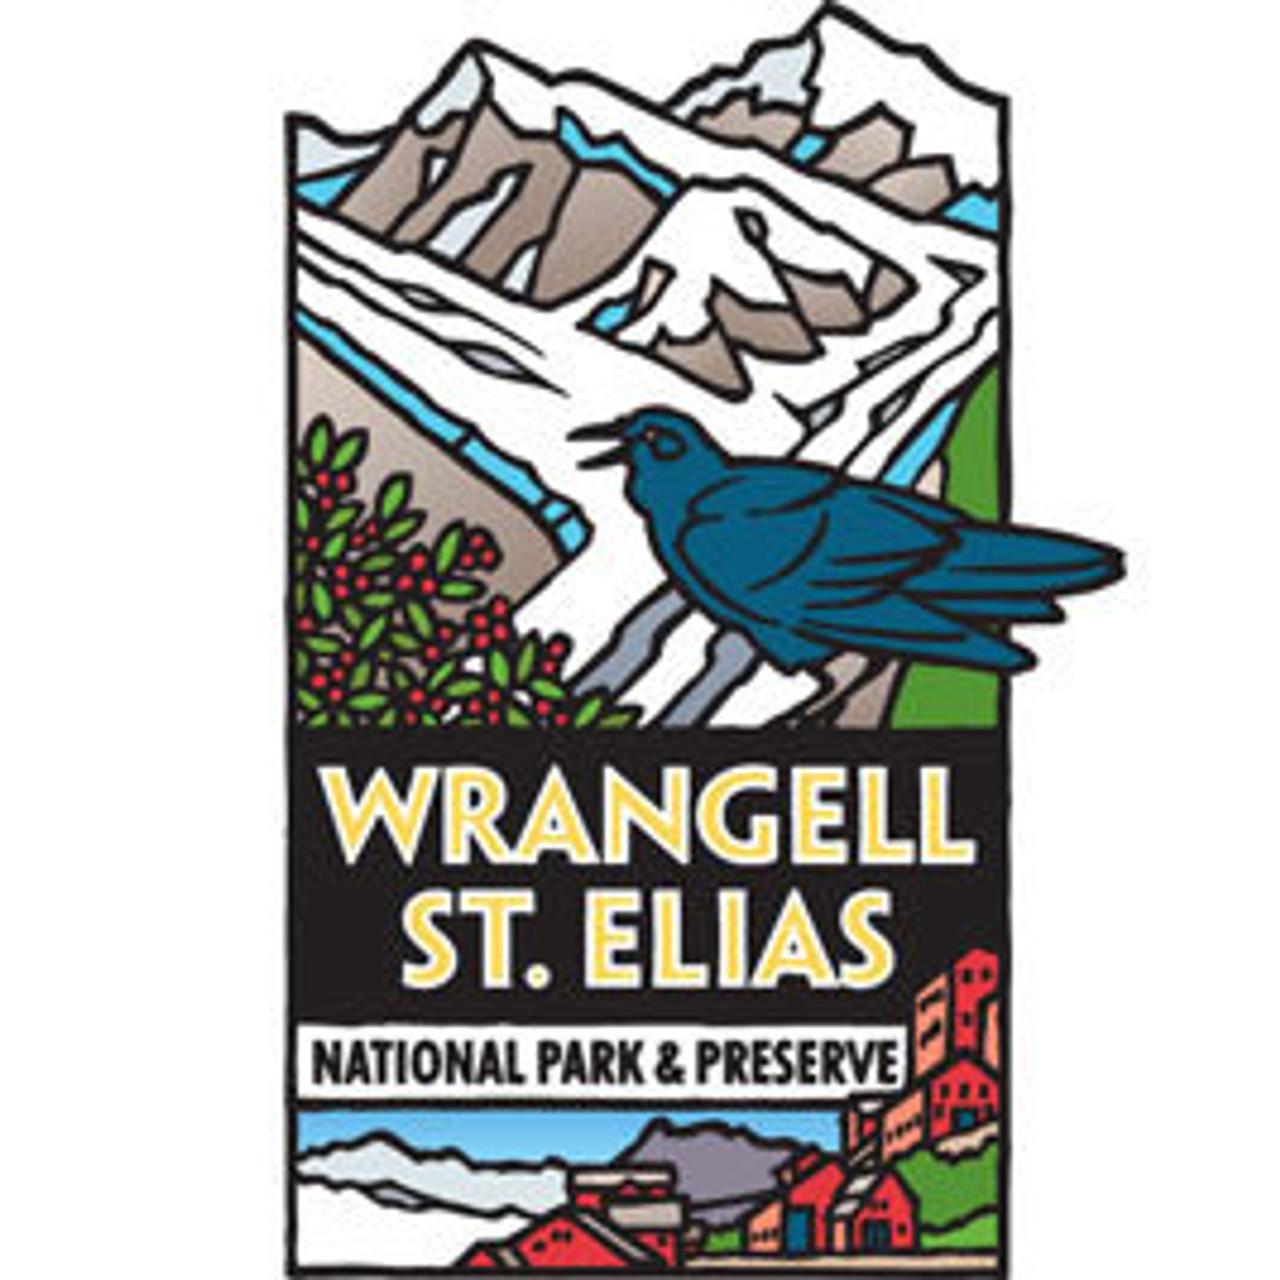 Wrangell - St Elias National Park & Preserve